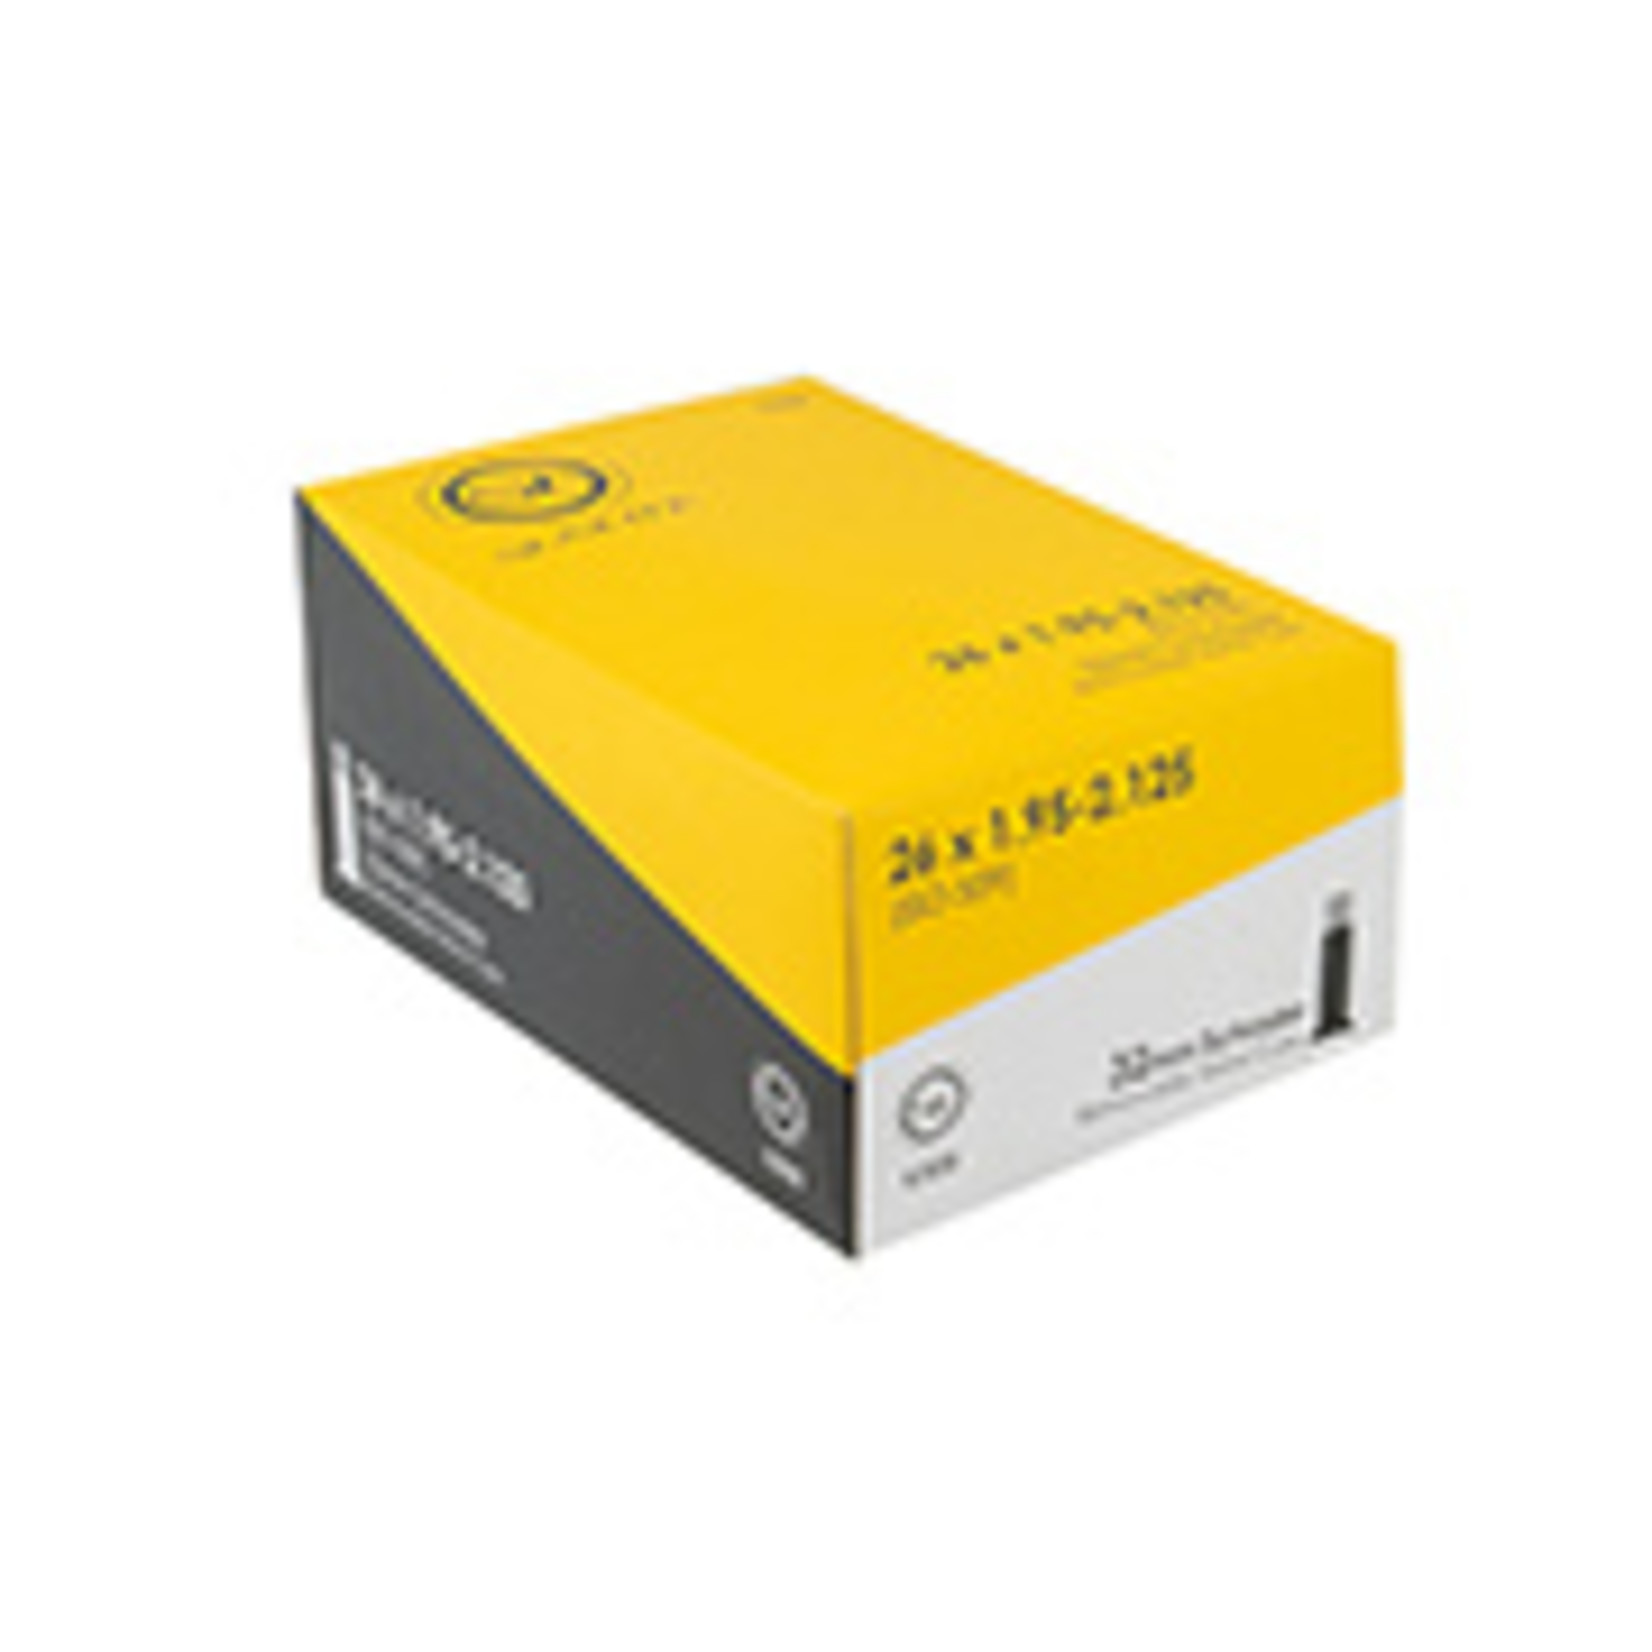 TUBES SUNLT 650Cx18-23 PV60/SMTH/RC (26x